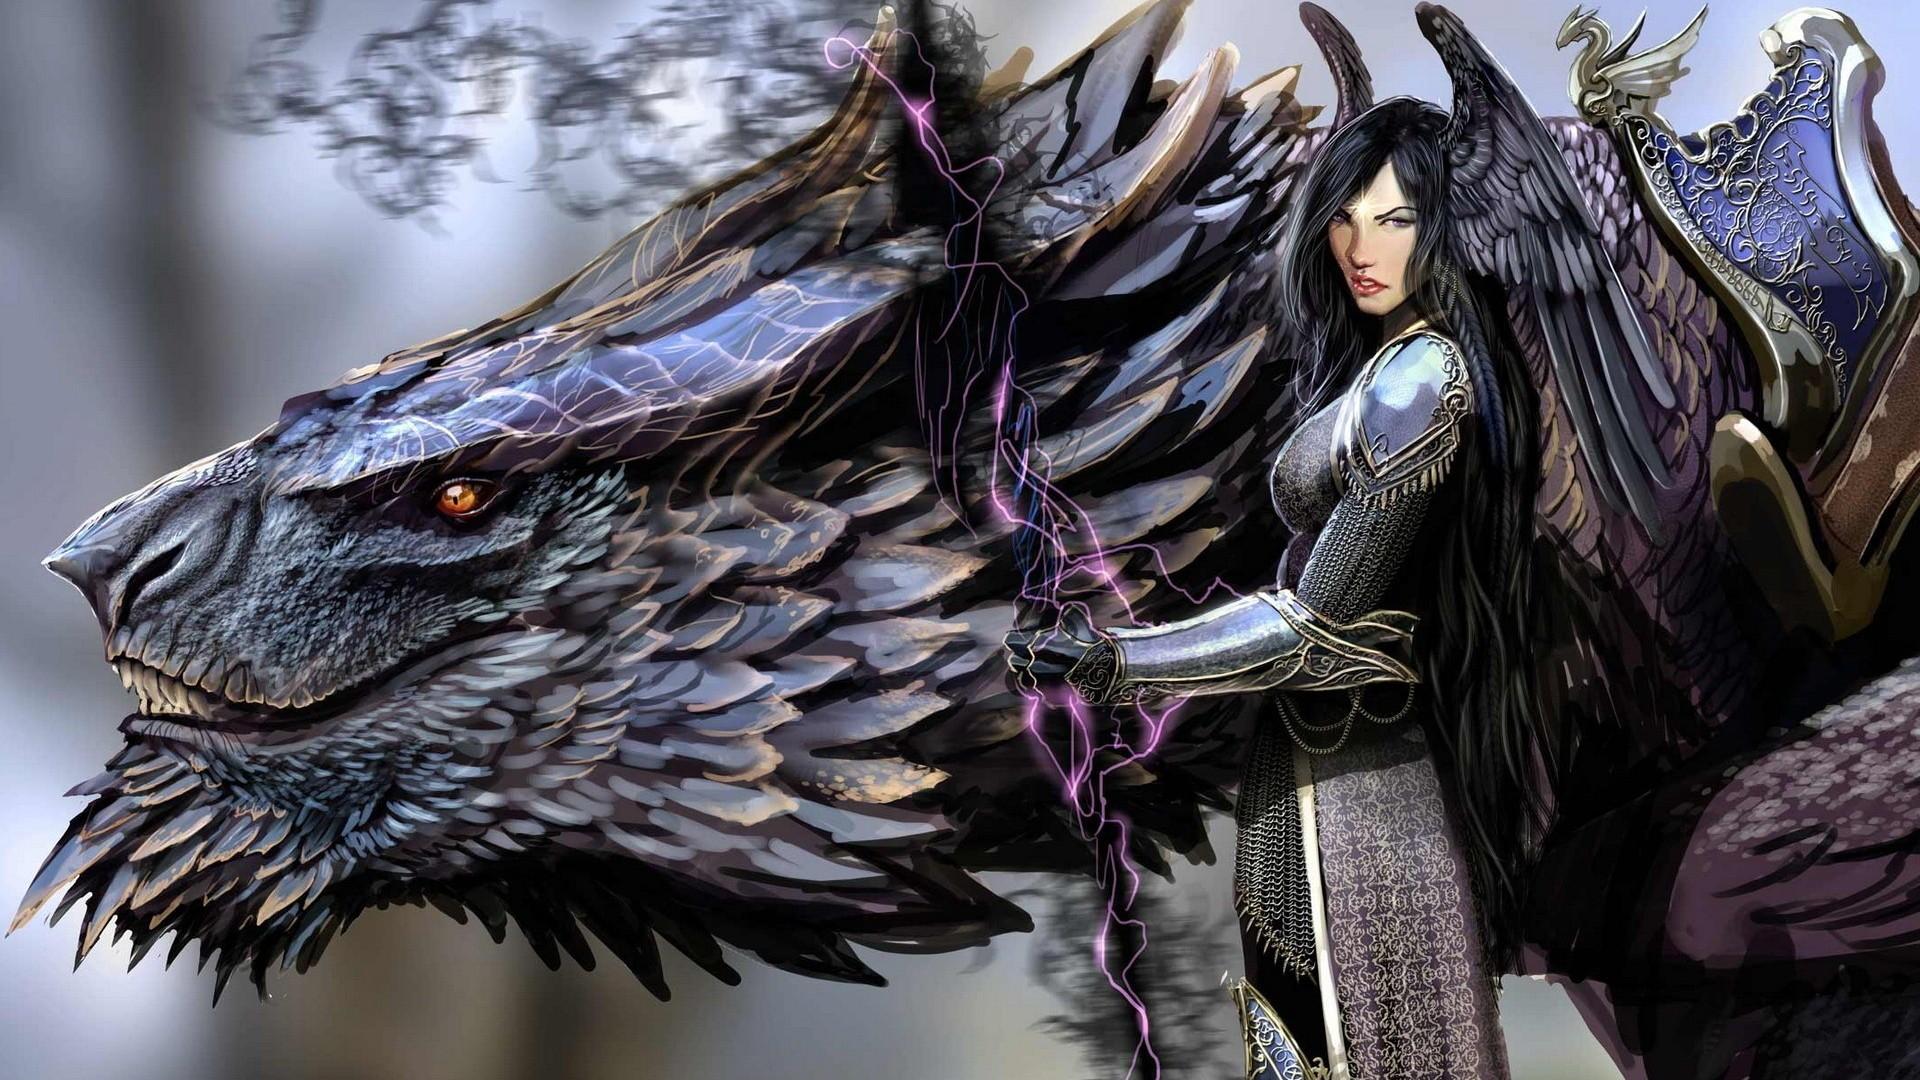 Download Black Dragon Fantasy HD Wallpaper 4276 Full Size 1920x1080